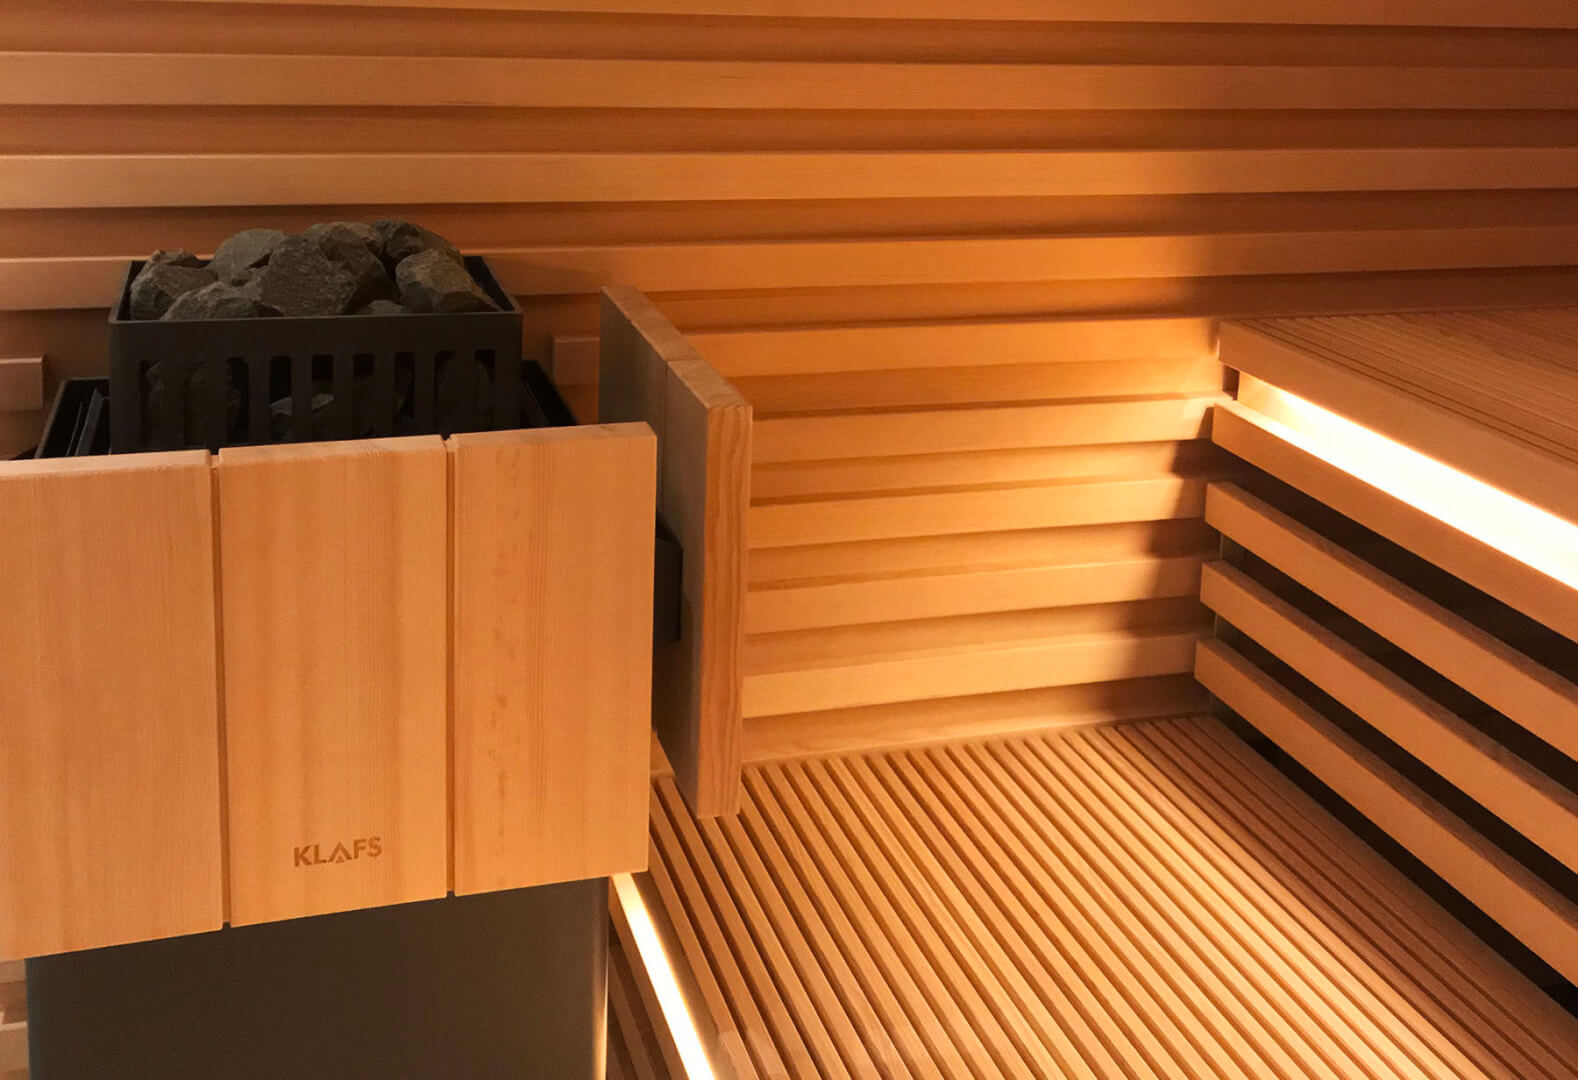 Hemlock benches and KLAFS Sauna heater